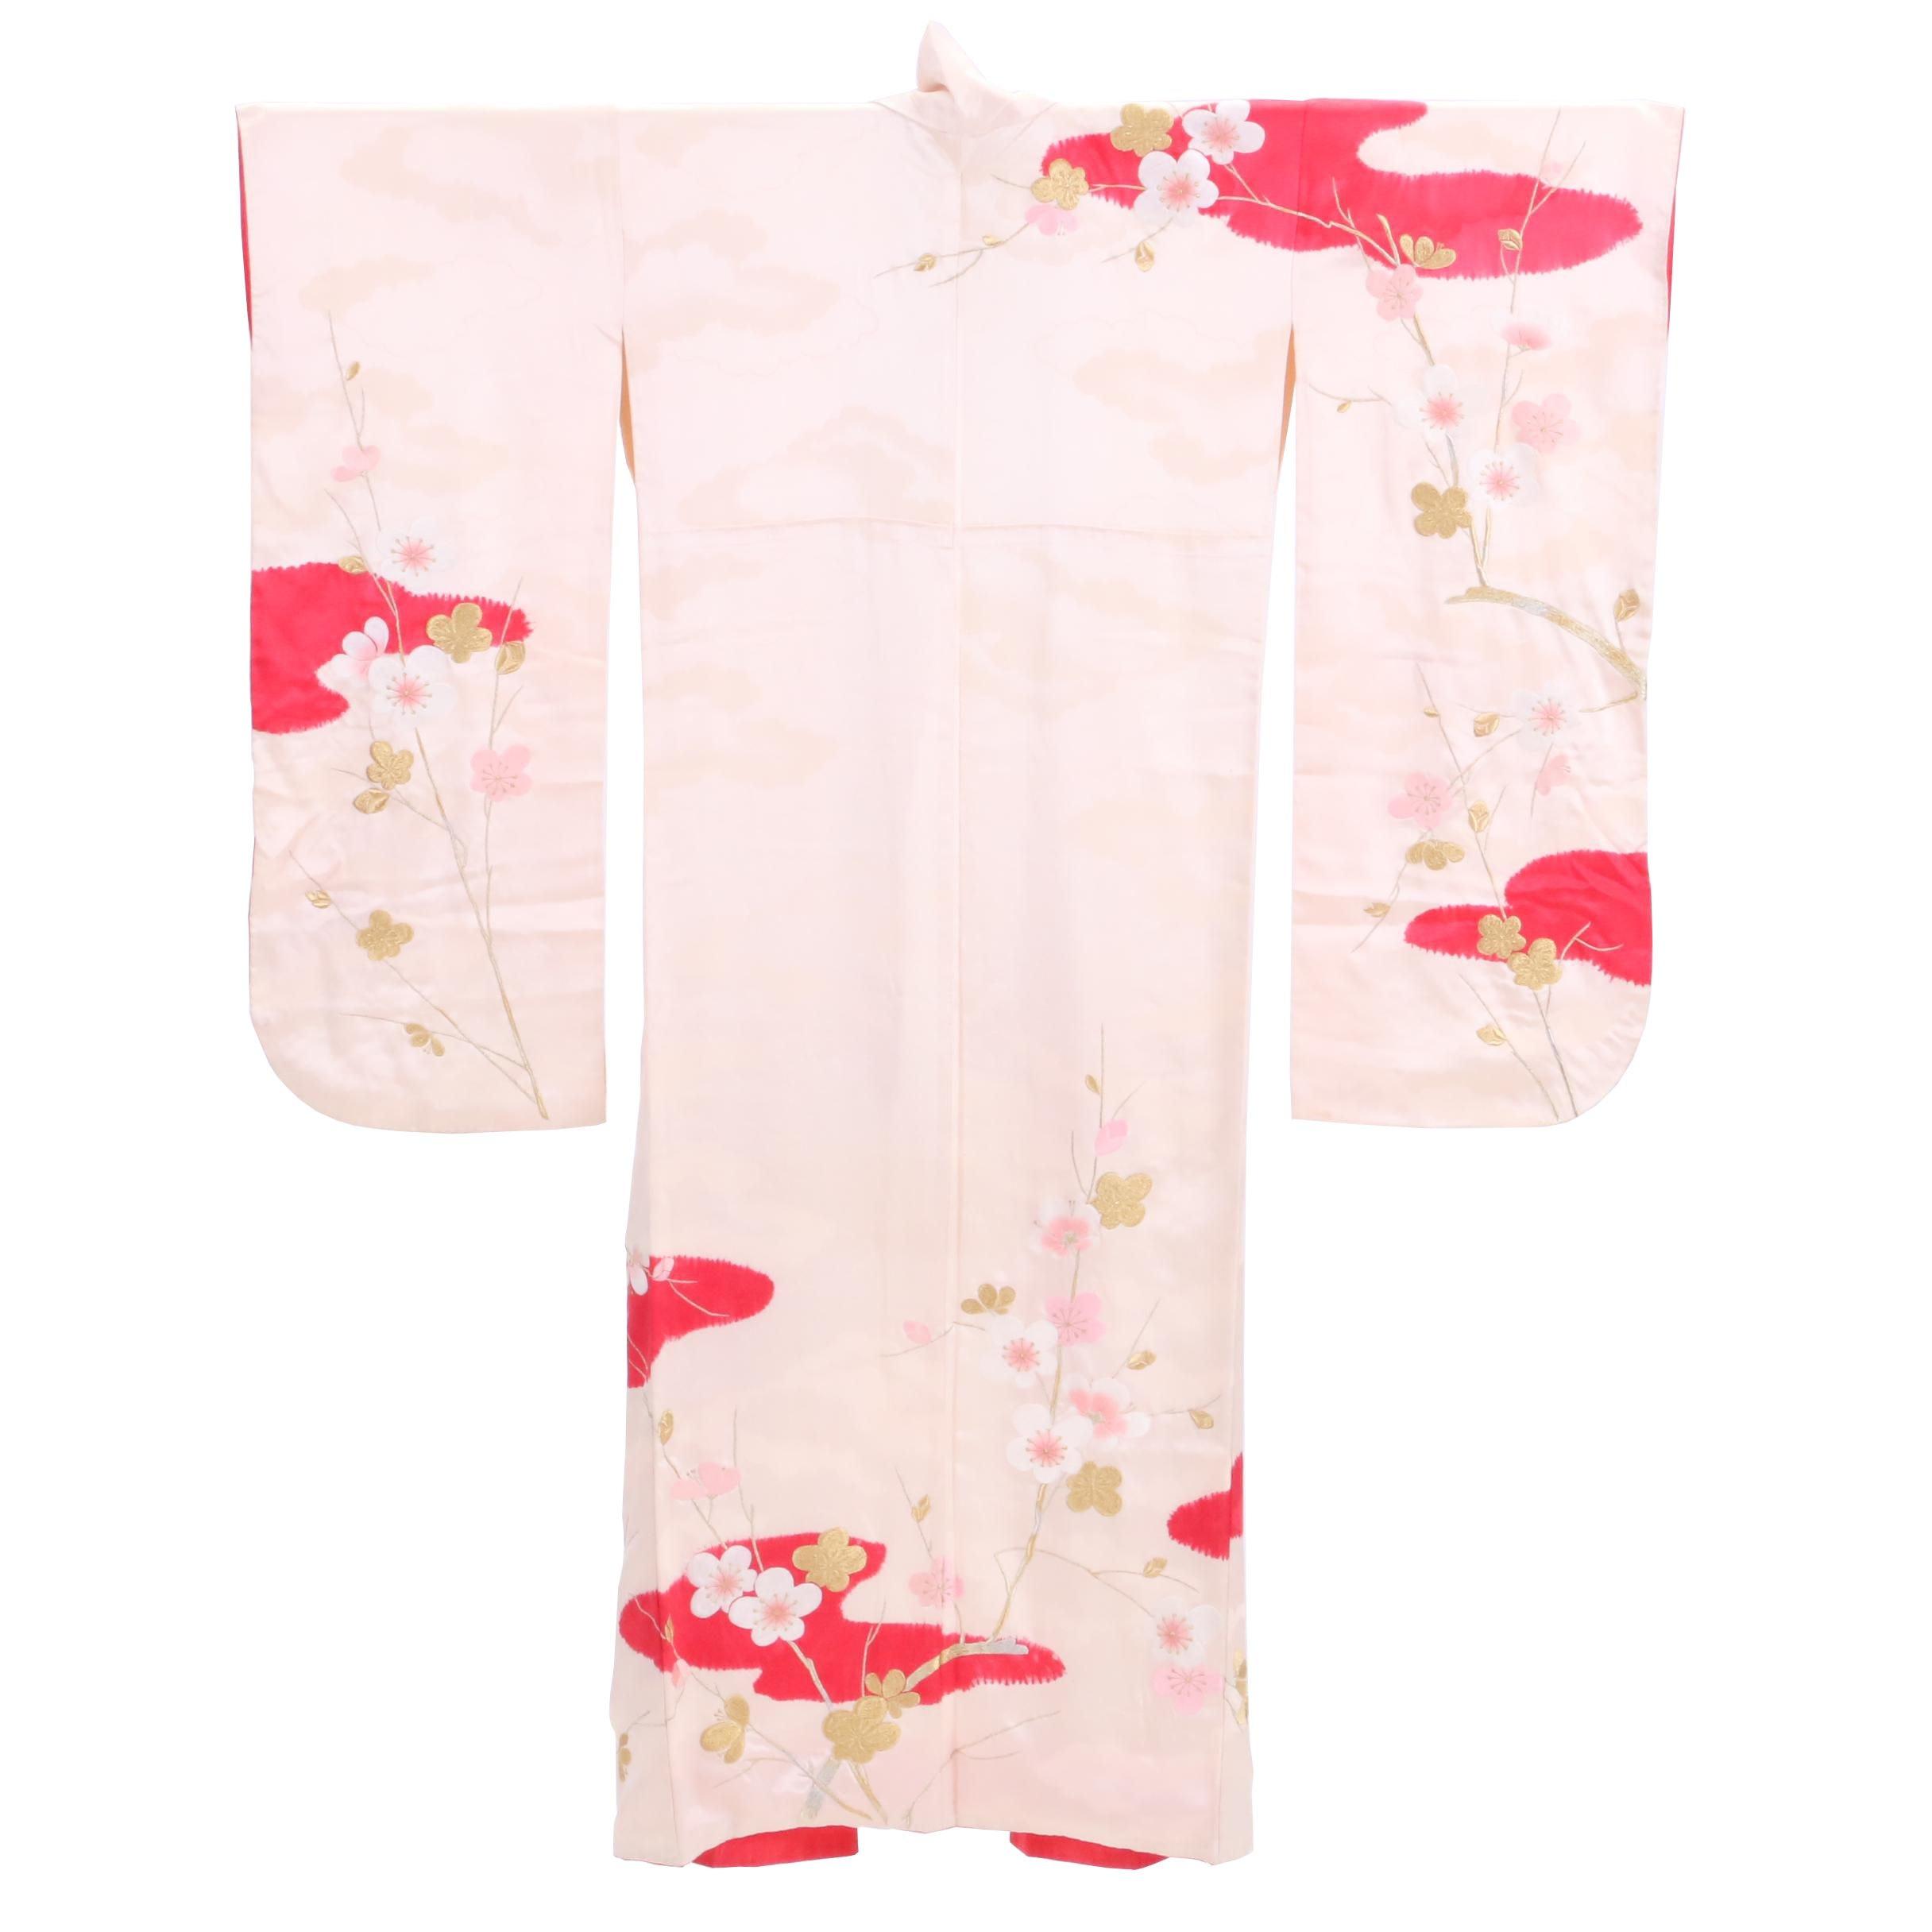 Circa 1960s Vintage Japanese Silk Damask Furisode Kimono